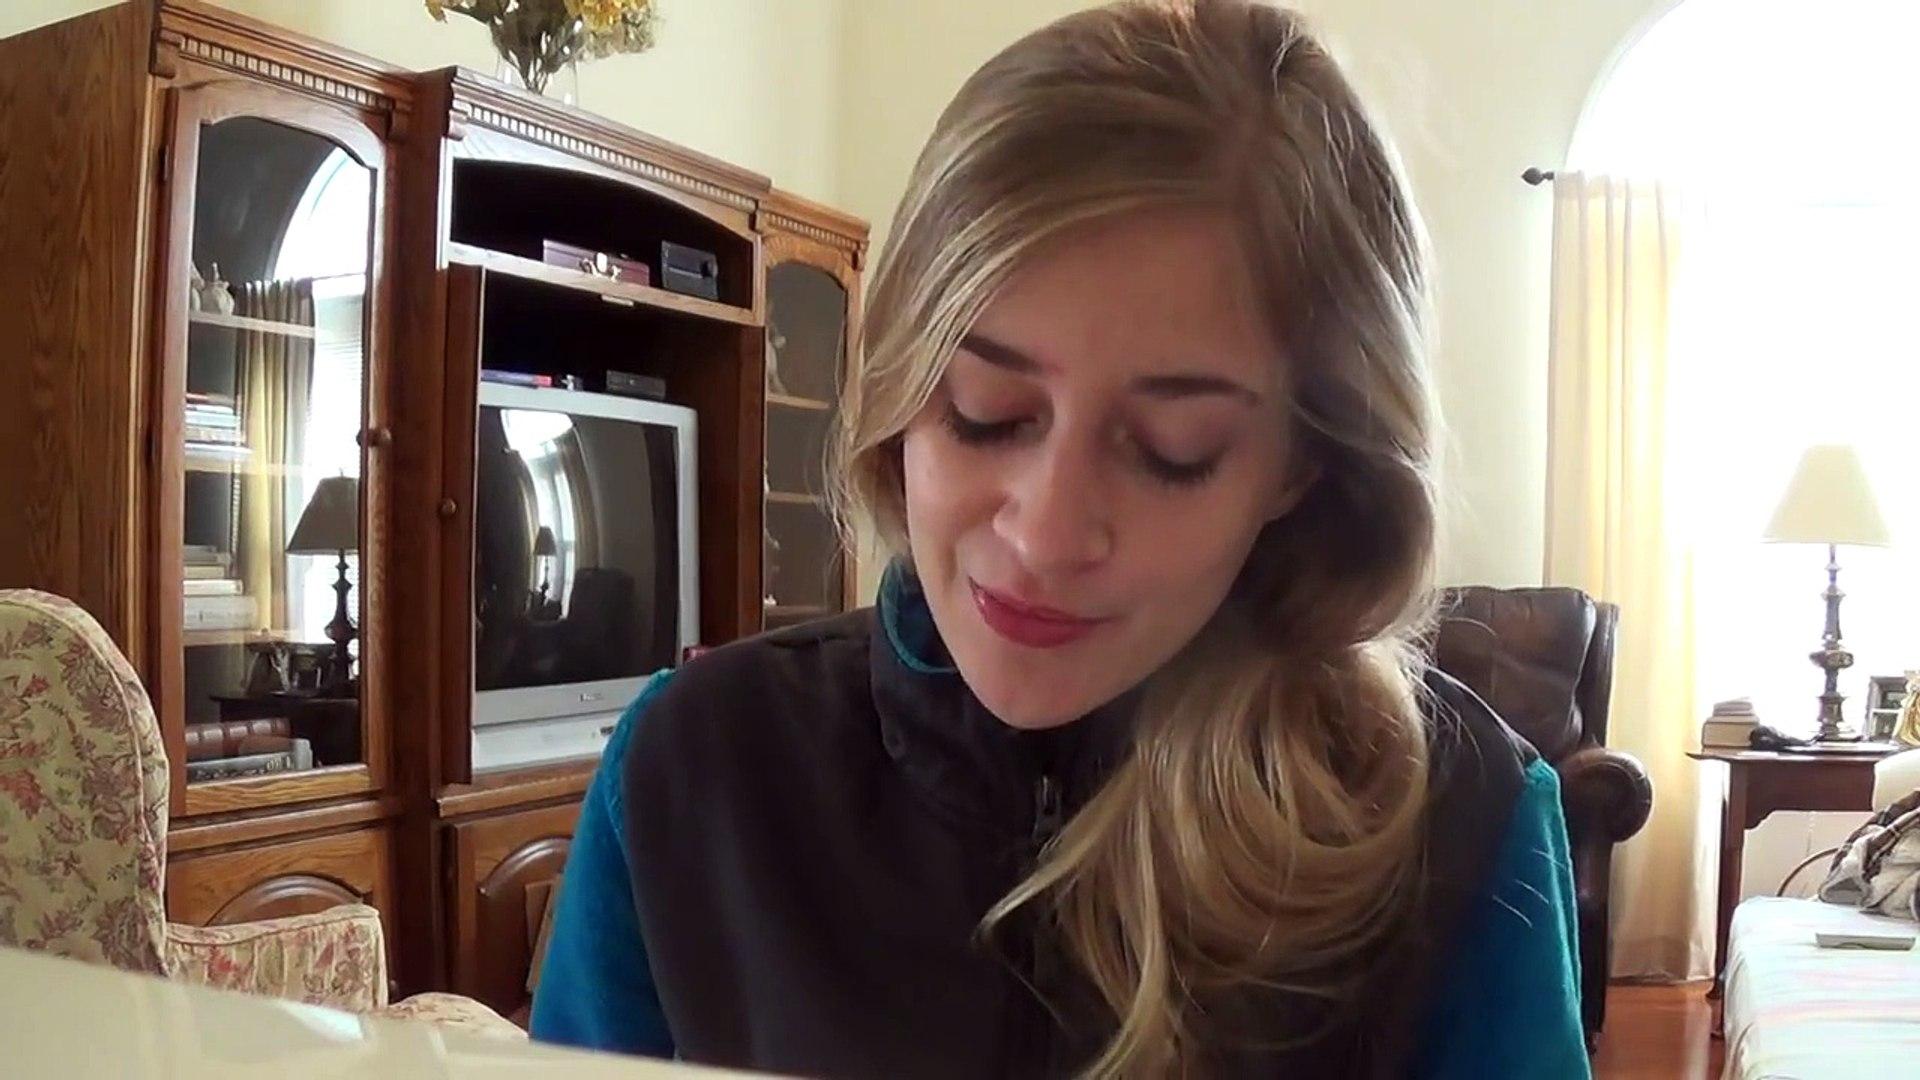 Anna Corley New Romantics Taylor Swift -hd Video Songs-English Video Songs-English Album Songs-Lates